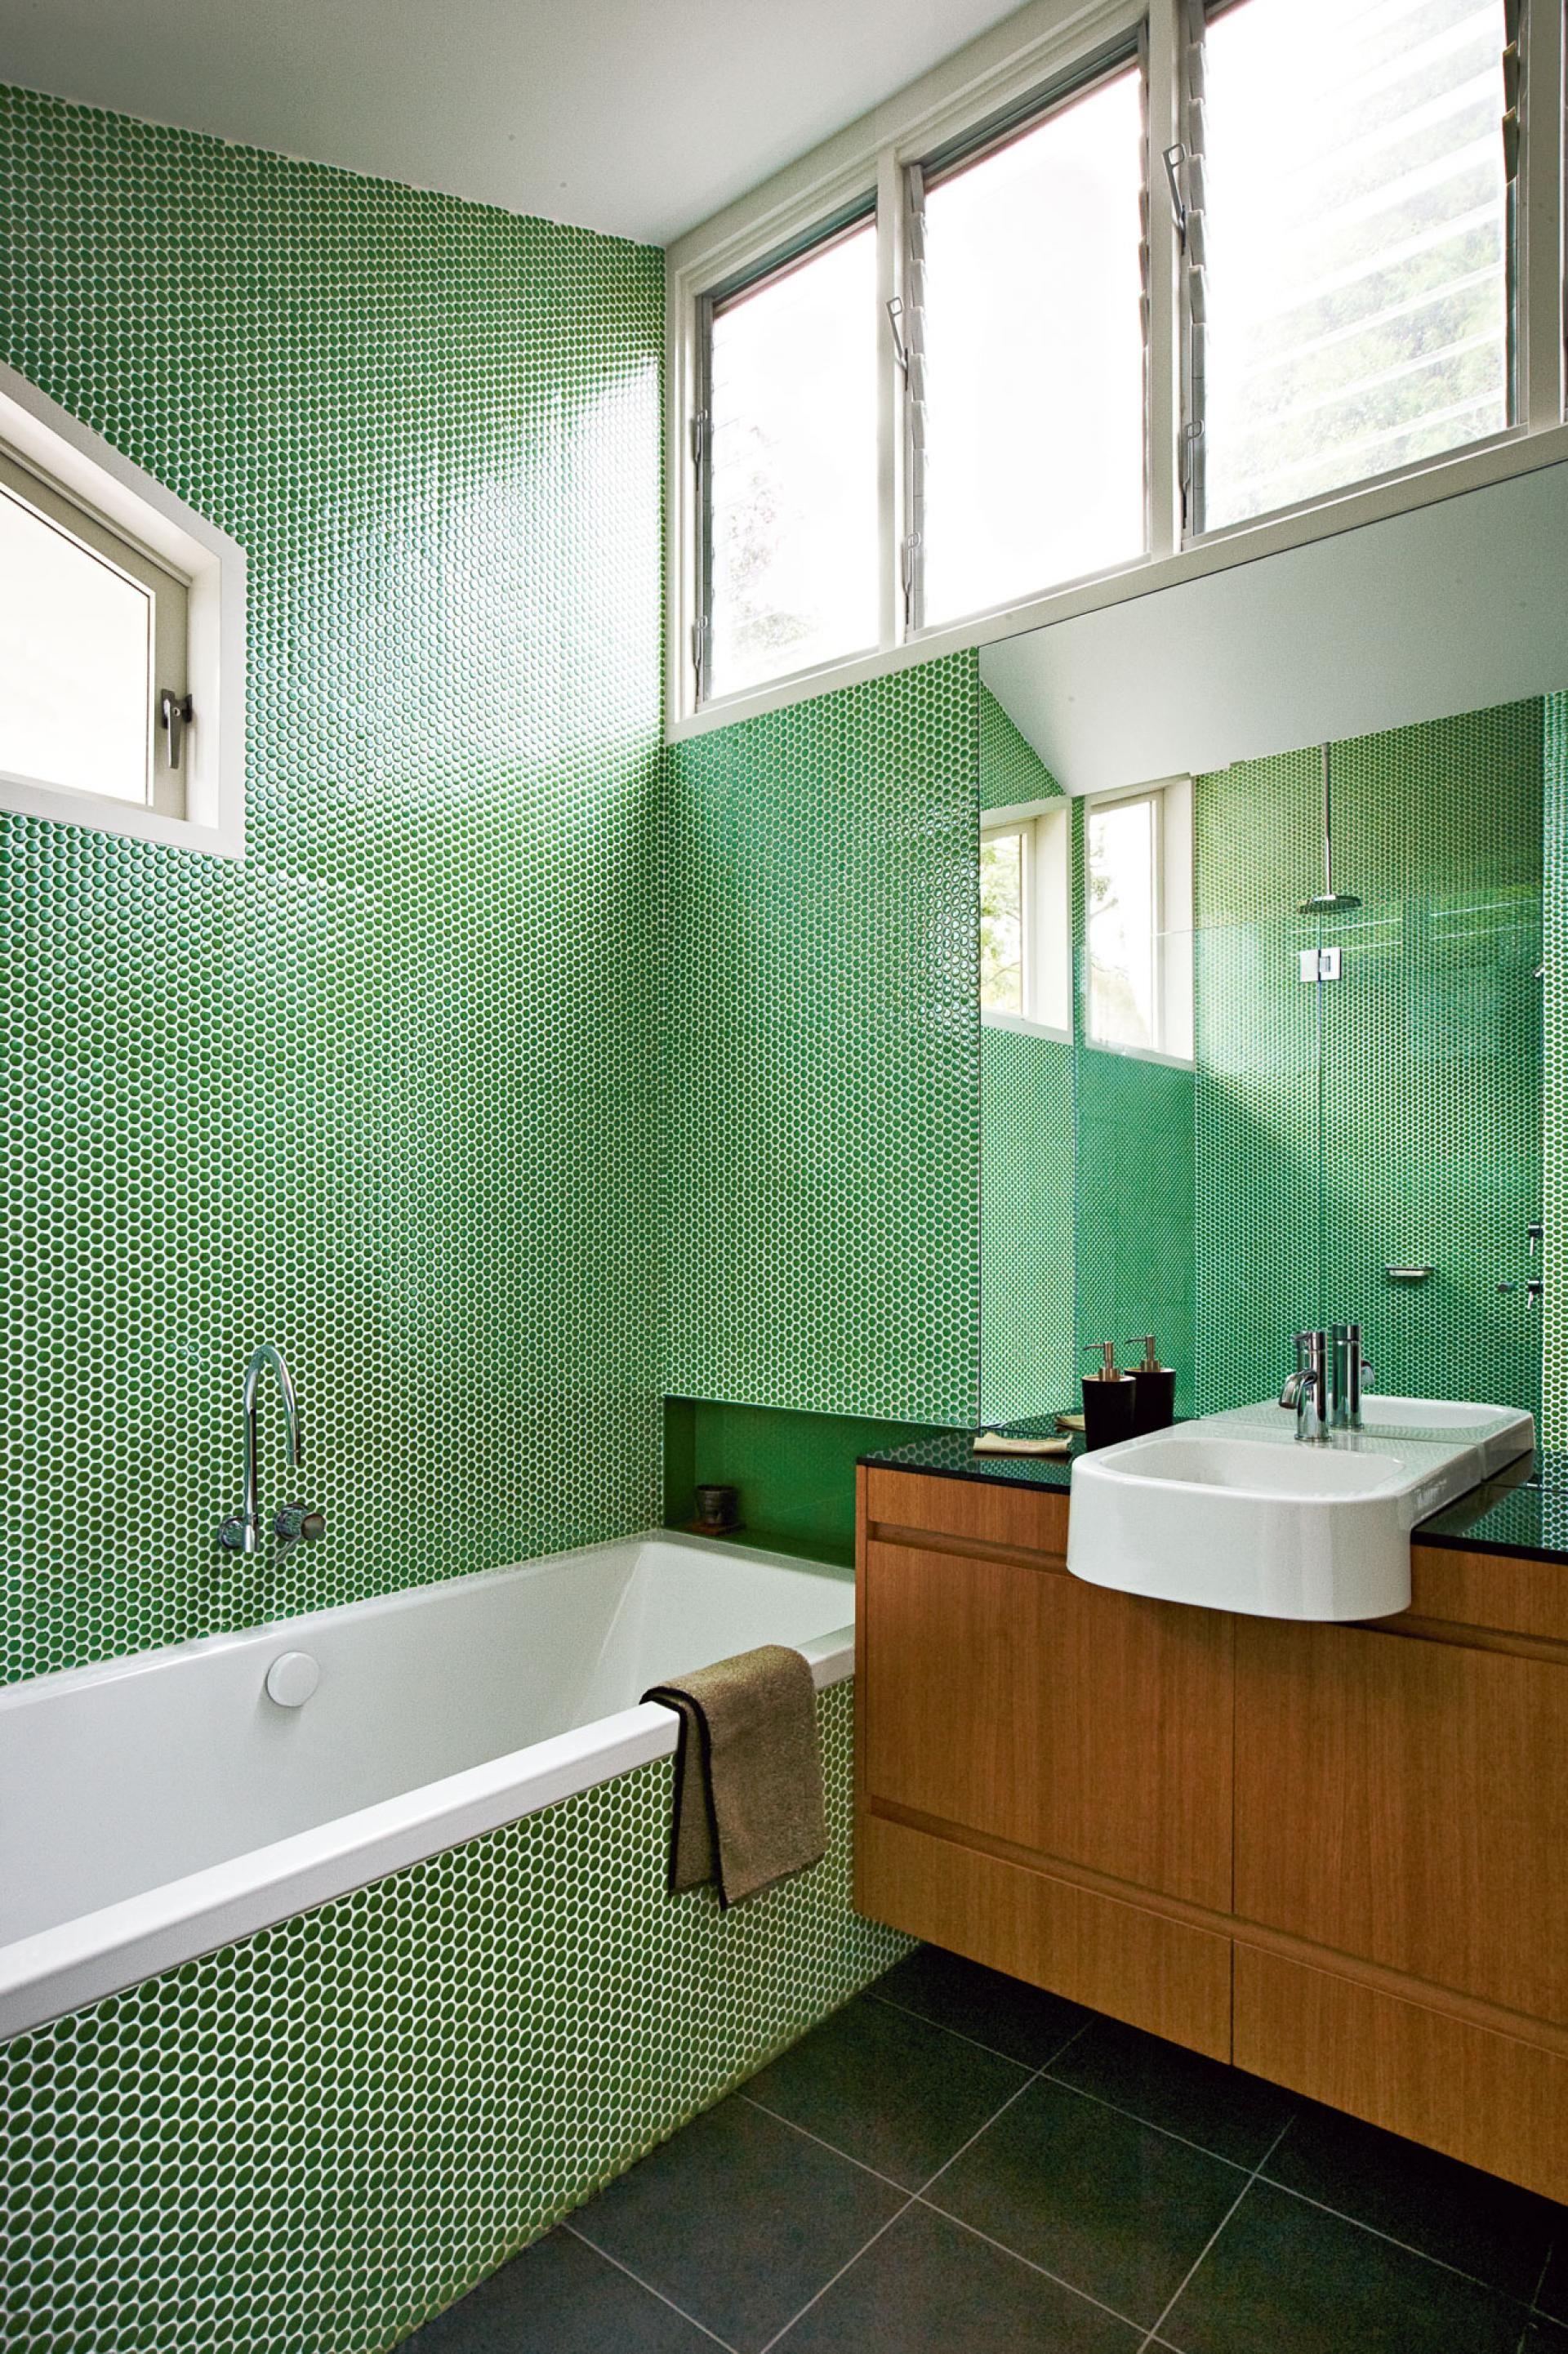 Salle De Bain Verte Foncee